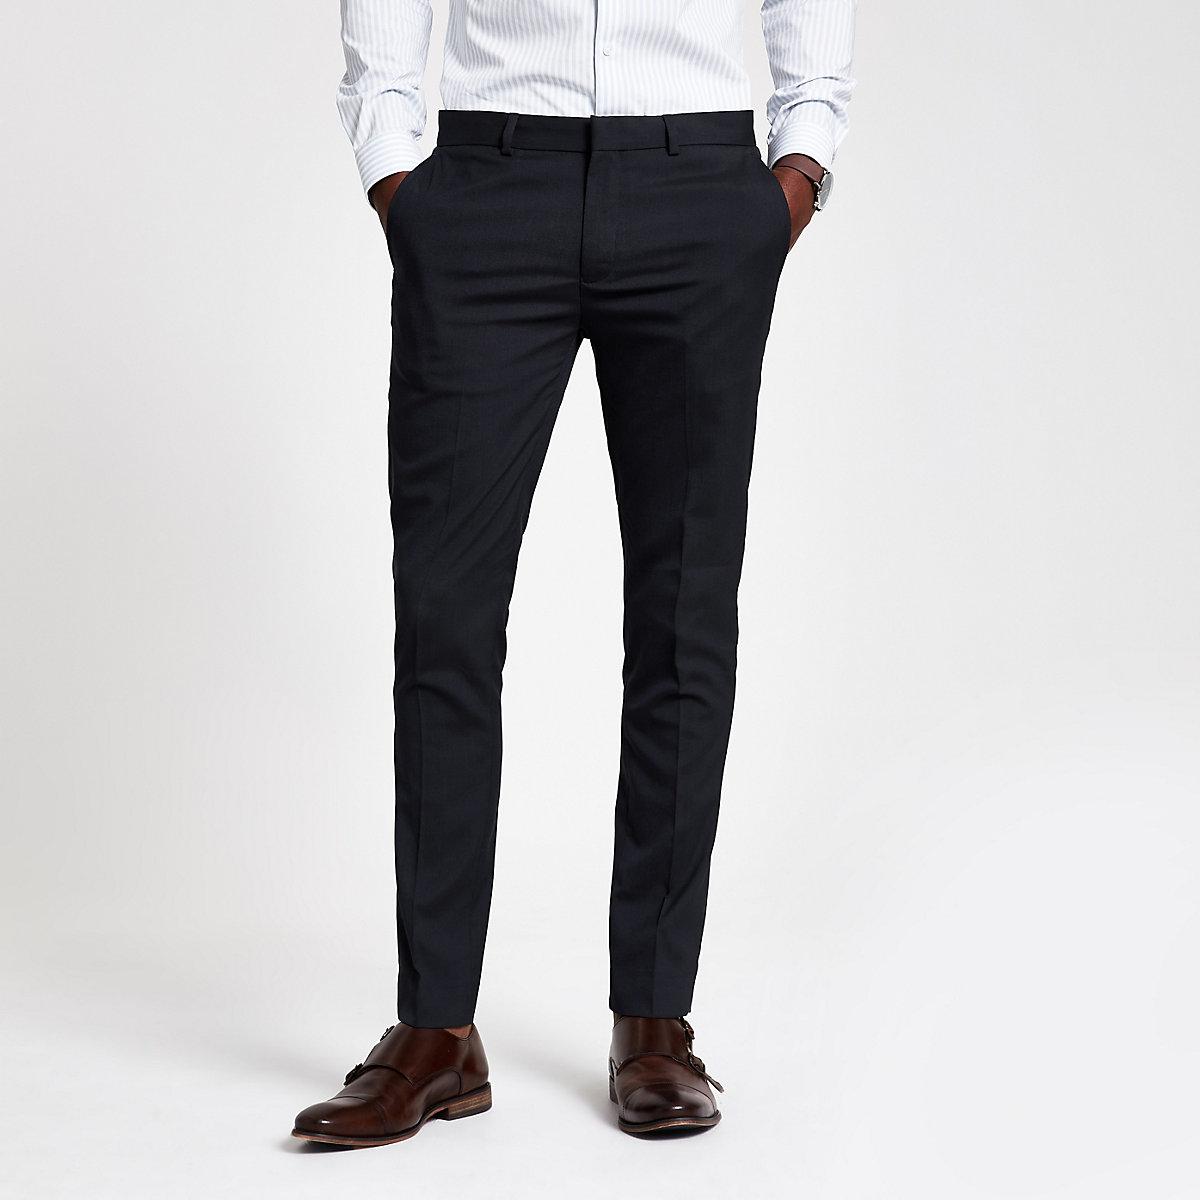 Navy super skinny fit smart pants